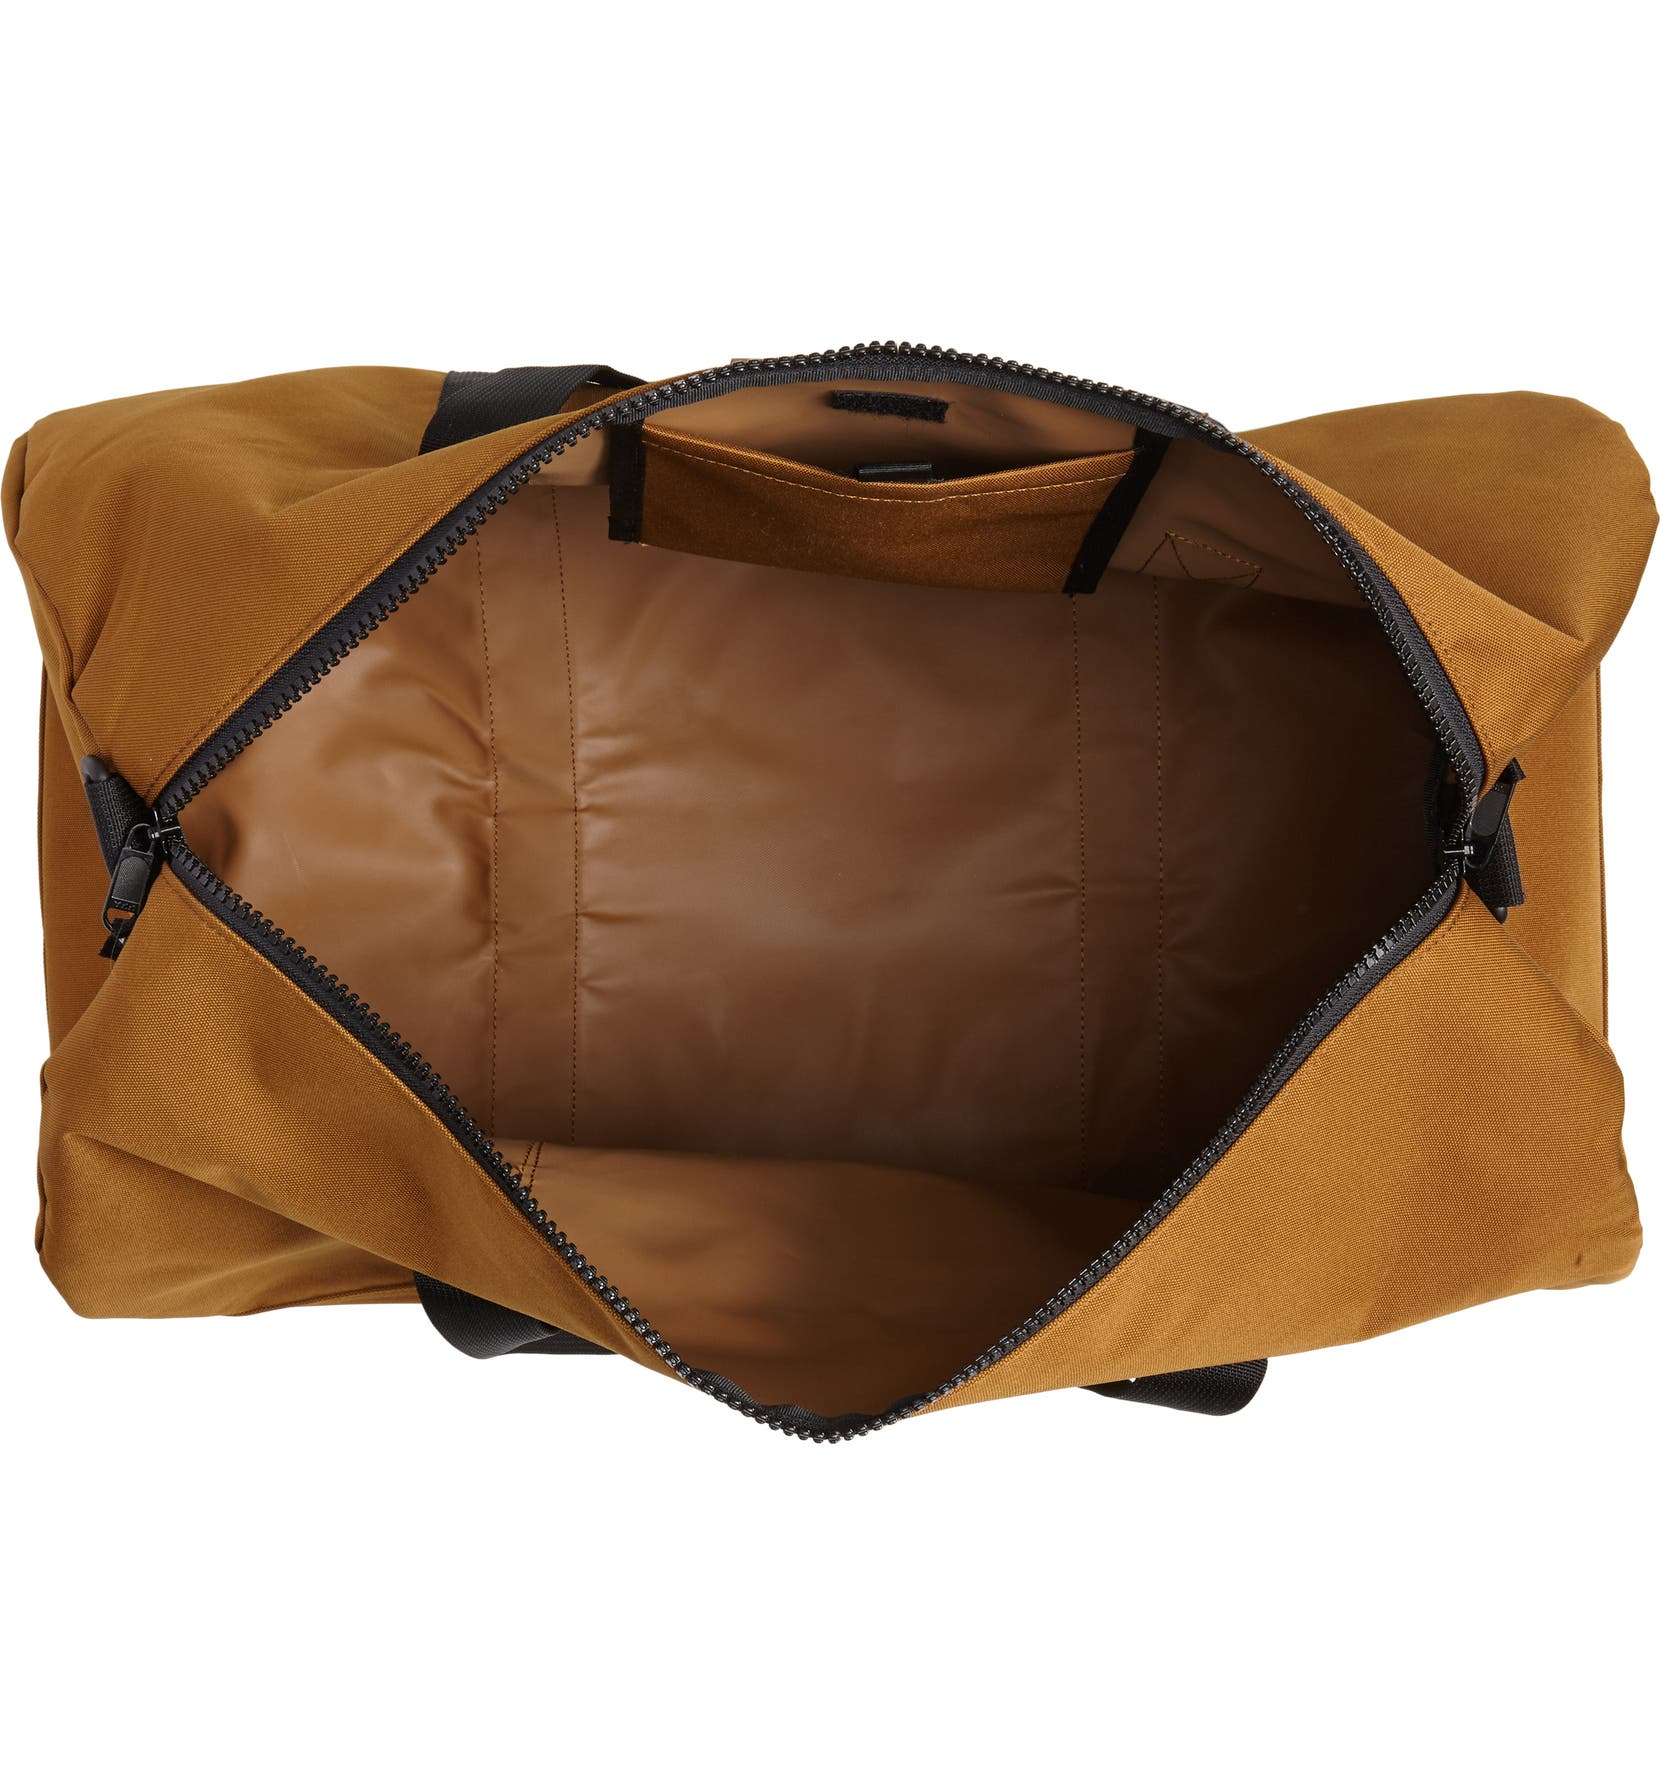 Carhartt Work in Progress Wright Water Repellent Duffel Bag  31f82e676731e